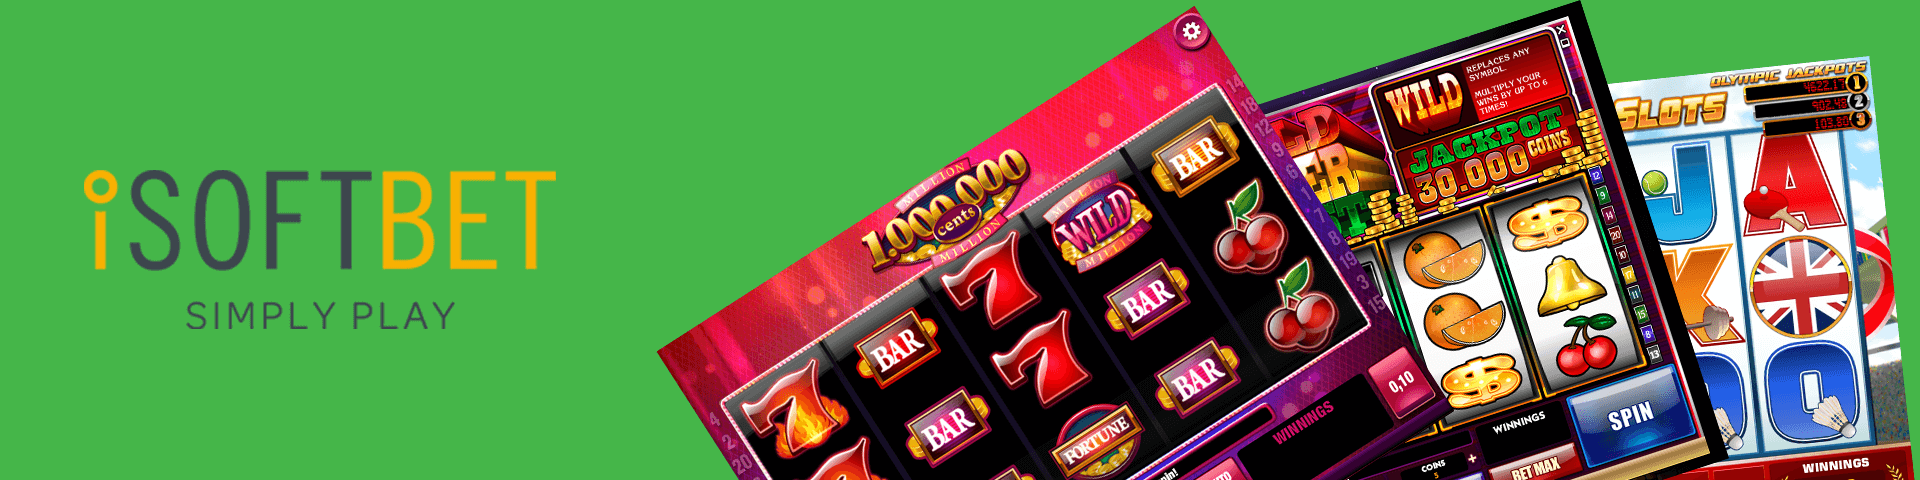 jocuri-casino-iSoftBet-multabafta-slider